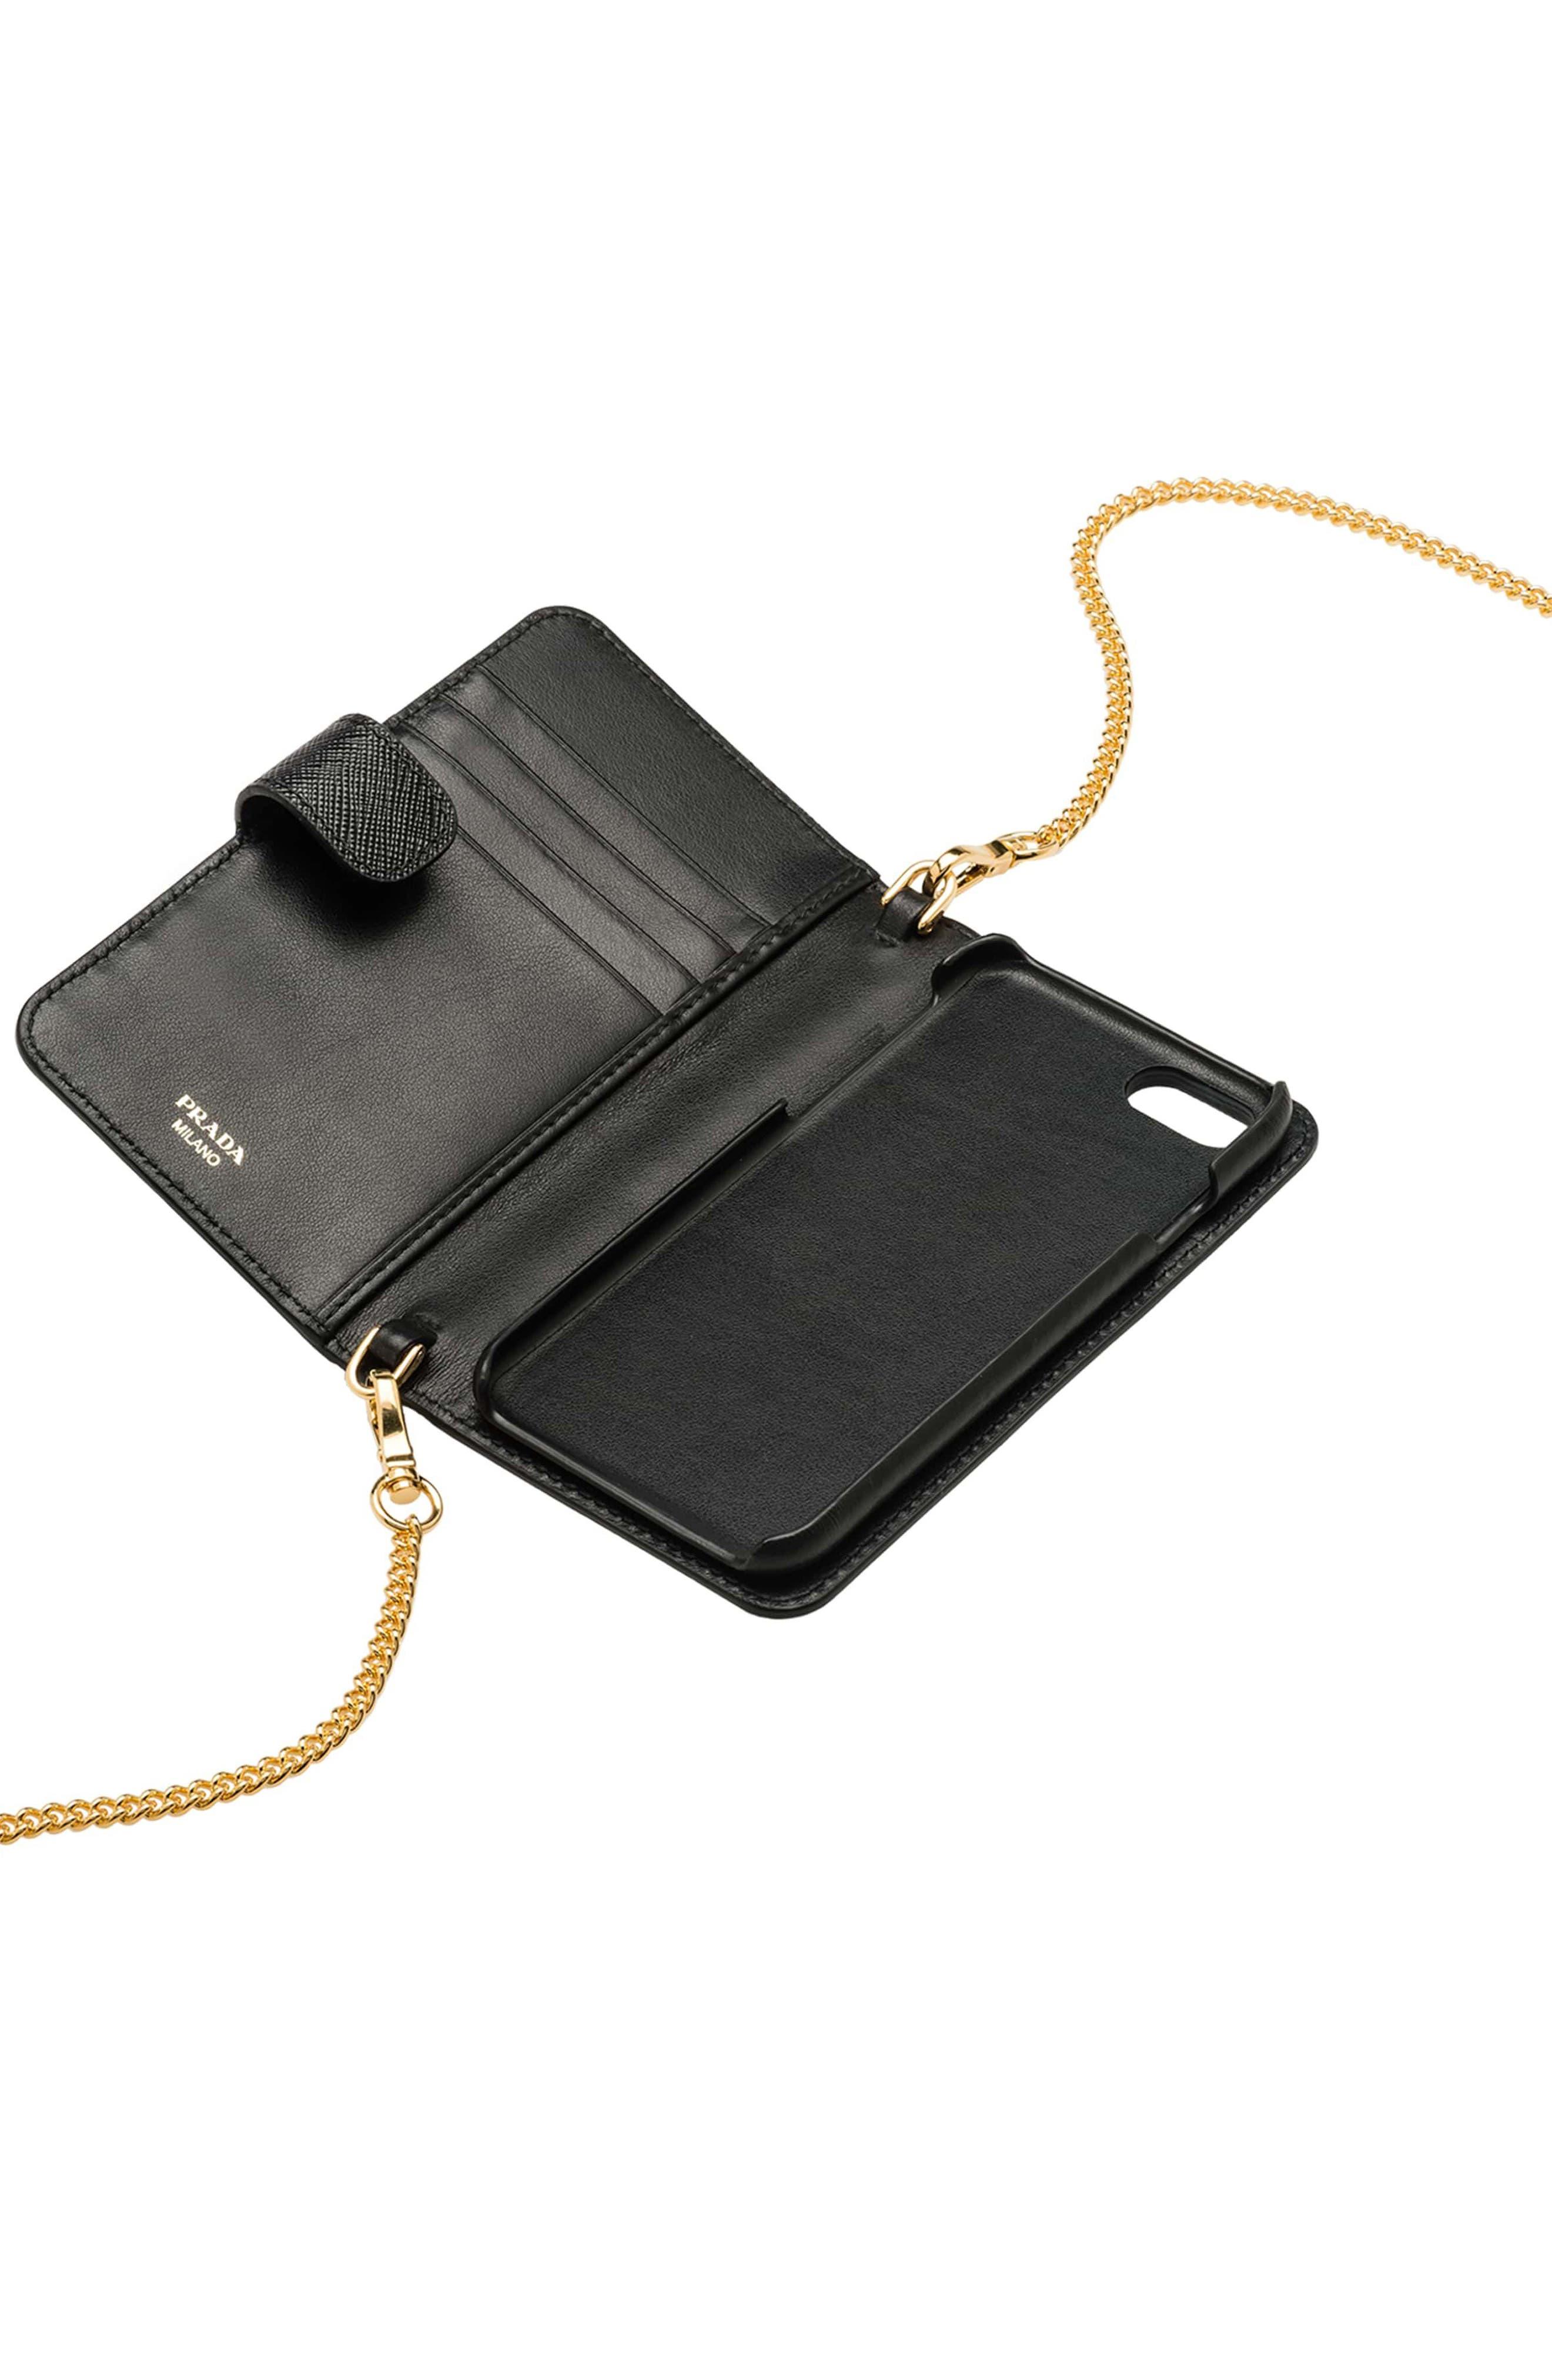 PRADA, Saffiano Metal Oro Chain Book Phone Wallet, Alternate thumbnail 2, color, 001